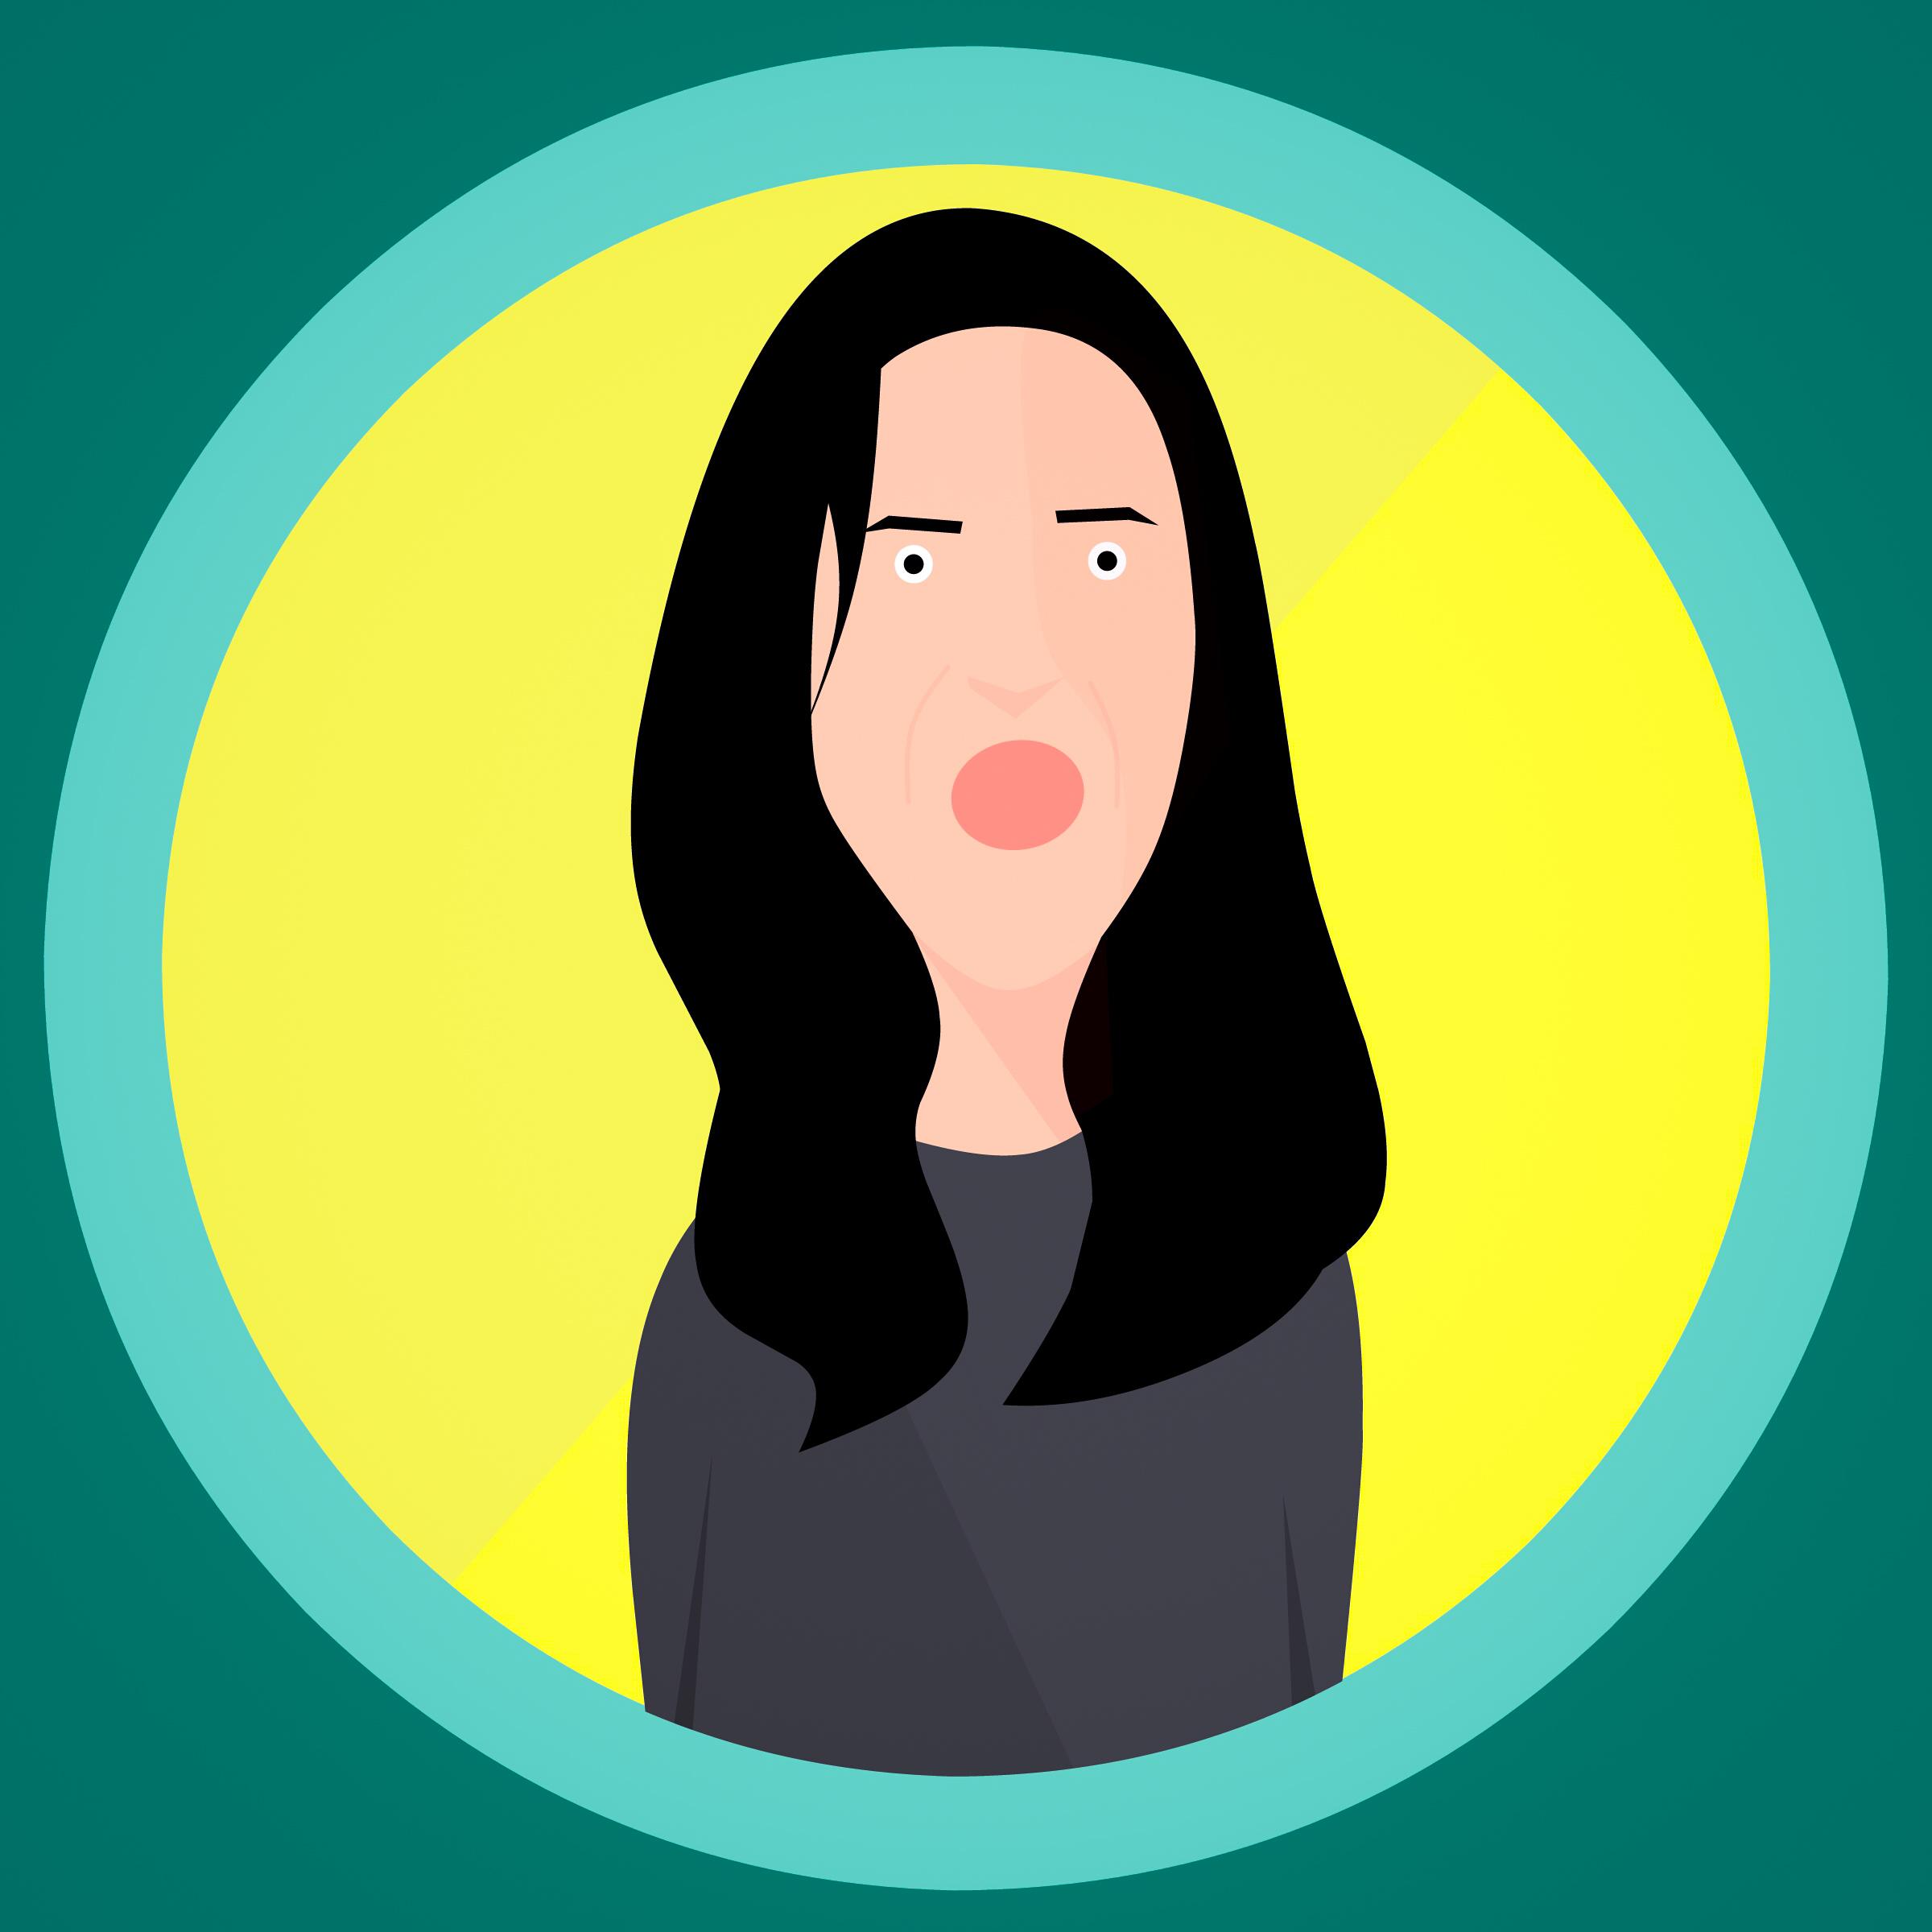 Gambar Marah Agresif Wanita Tingkah Laku Gambar Kartun